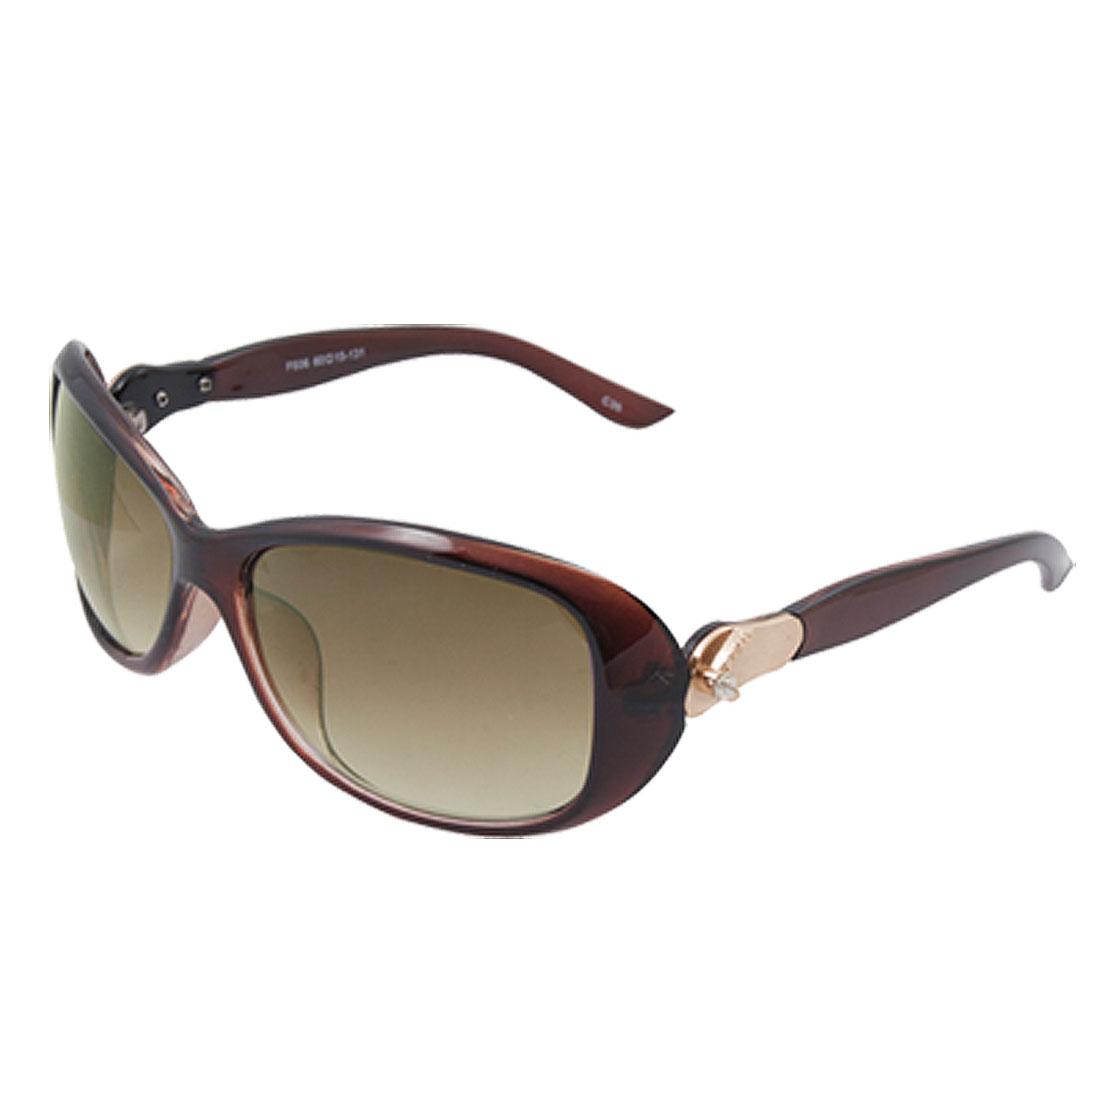 Oval Lens Coffee Plastic Full Frame Slippers Decor Ladies Sunglasses